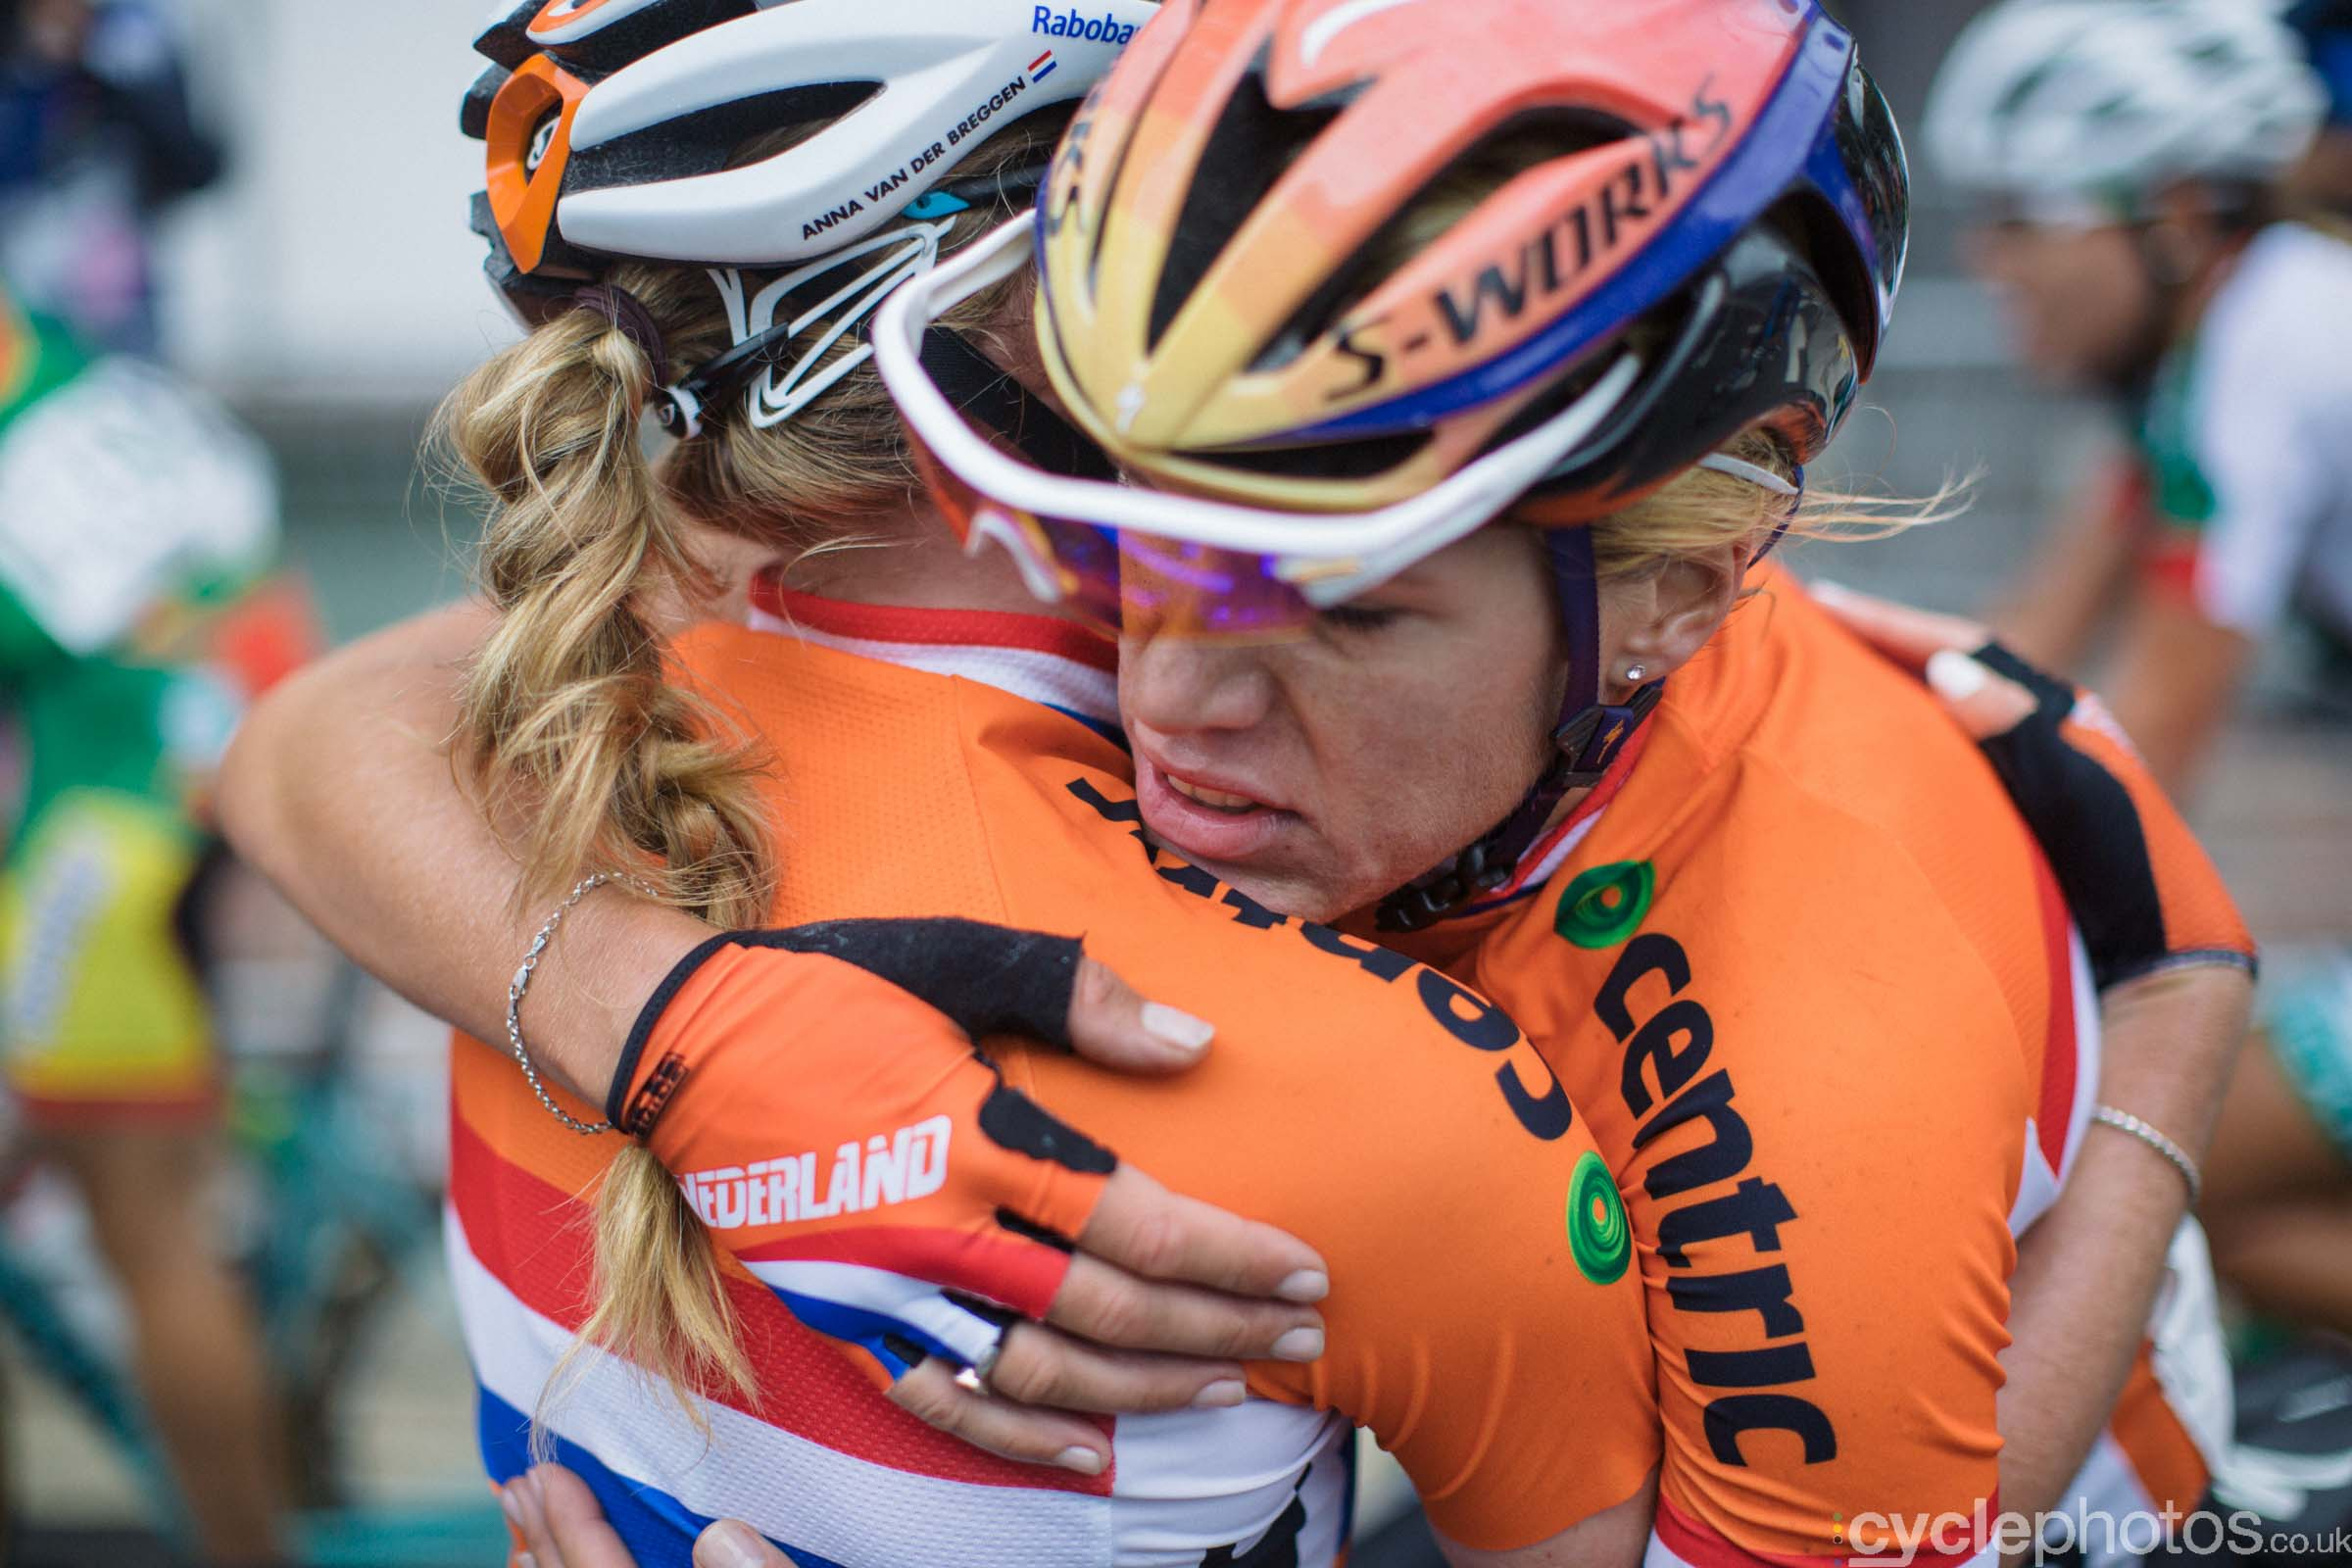 cyclephotos-world-champs-richmond-162508